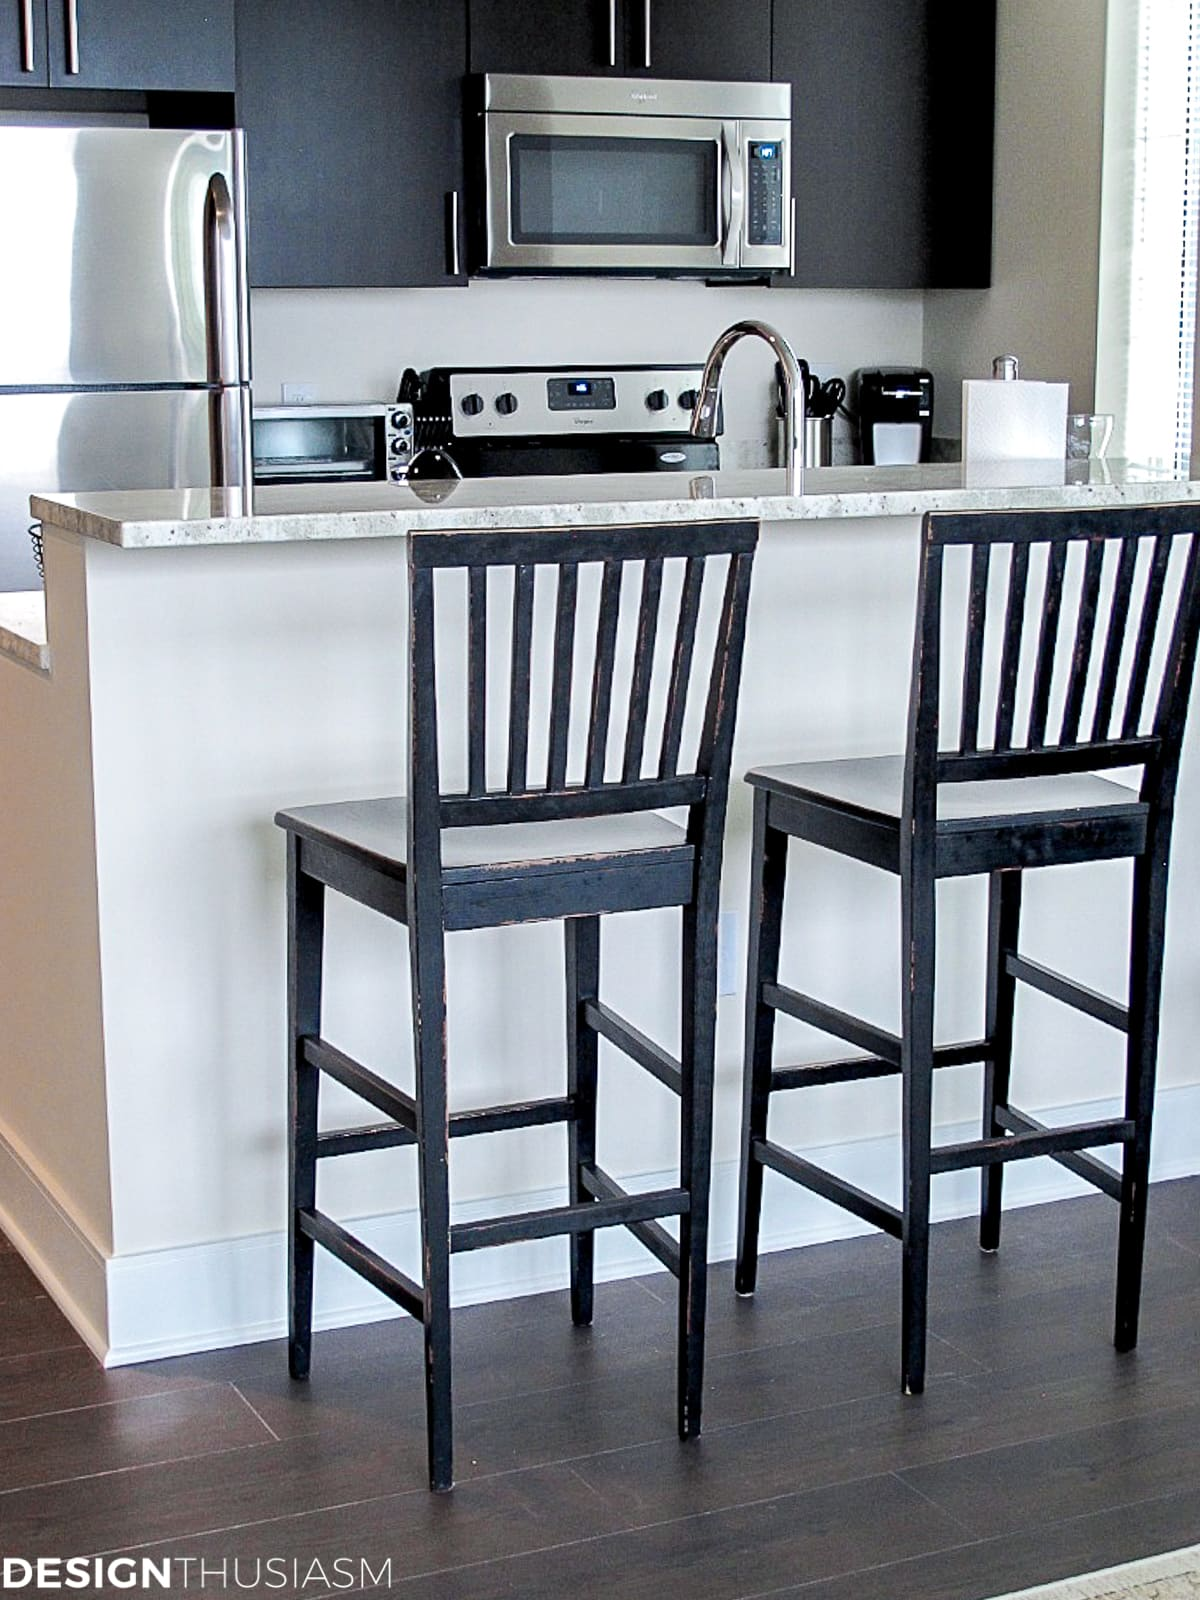 bachelor pad mens apartment kitchen